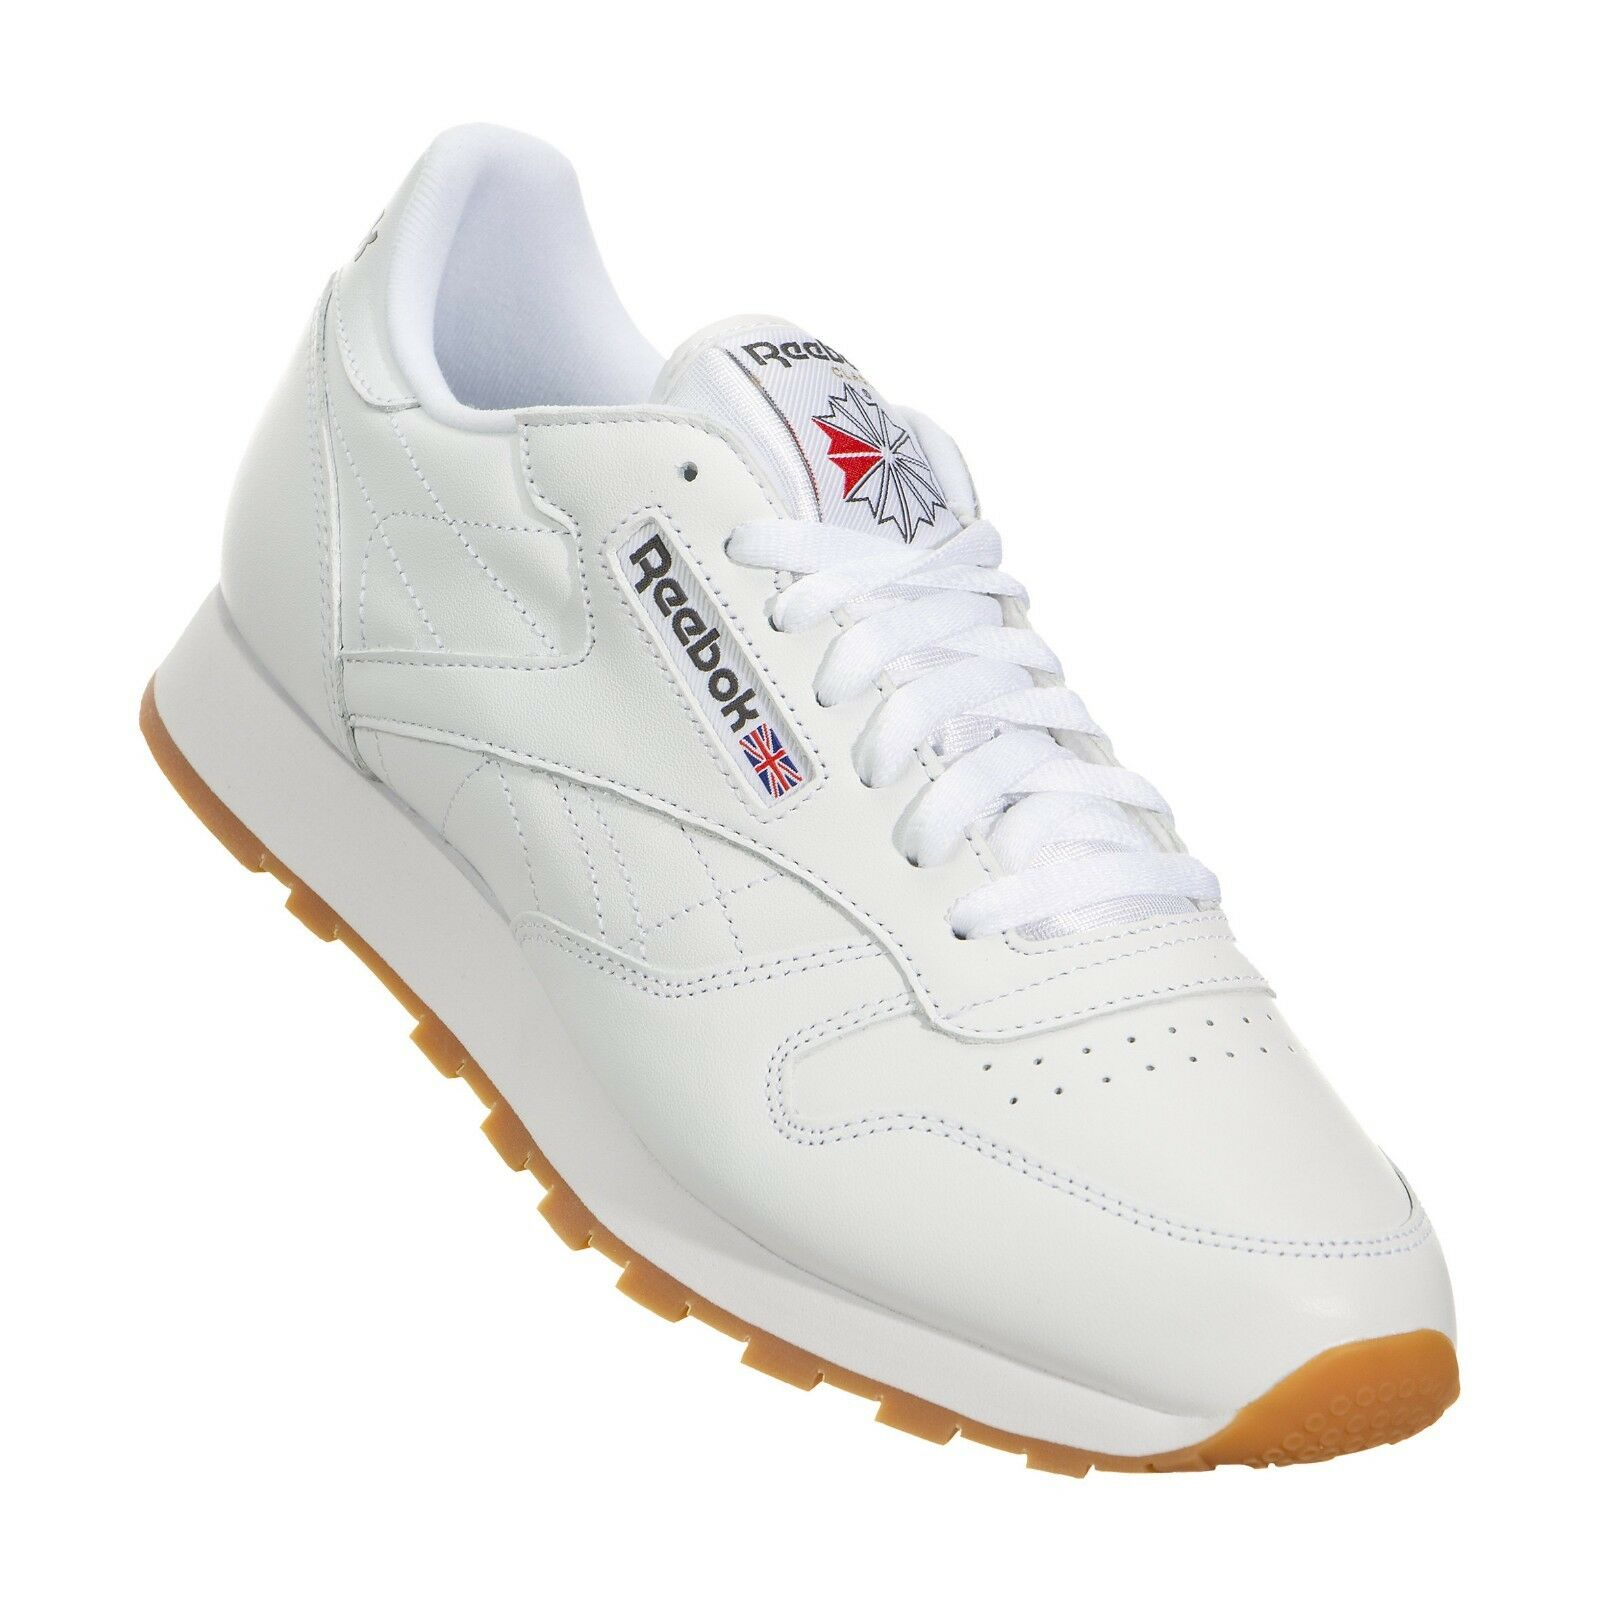 Reebok CL Leather TC Tiger Camo White